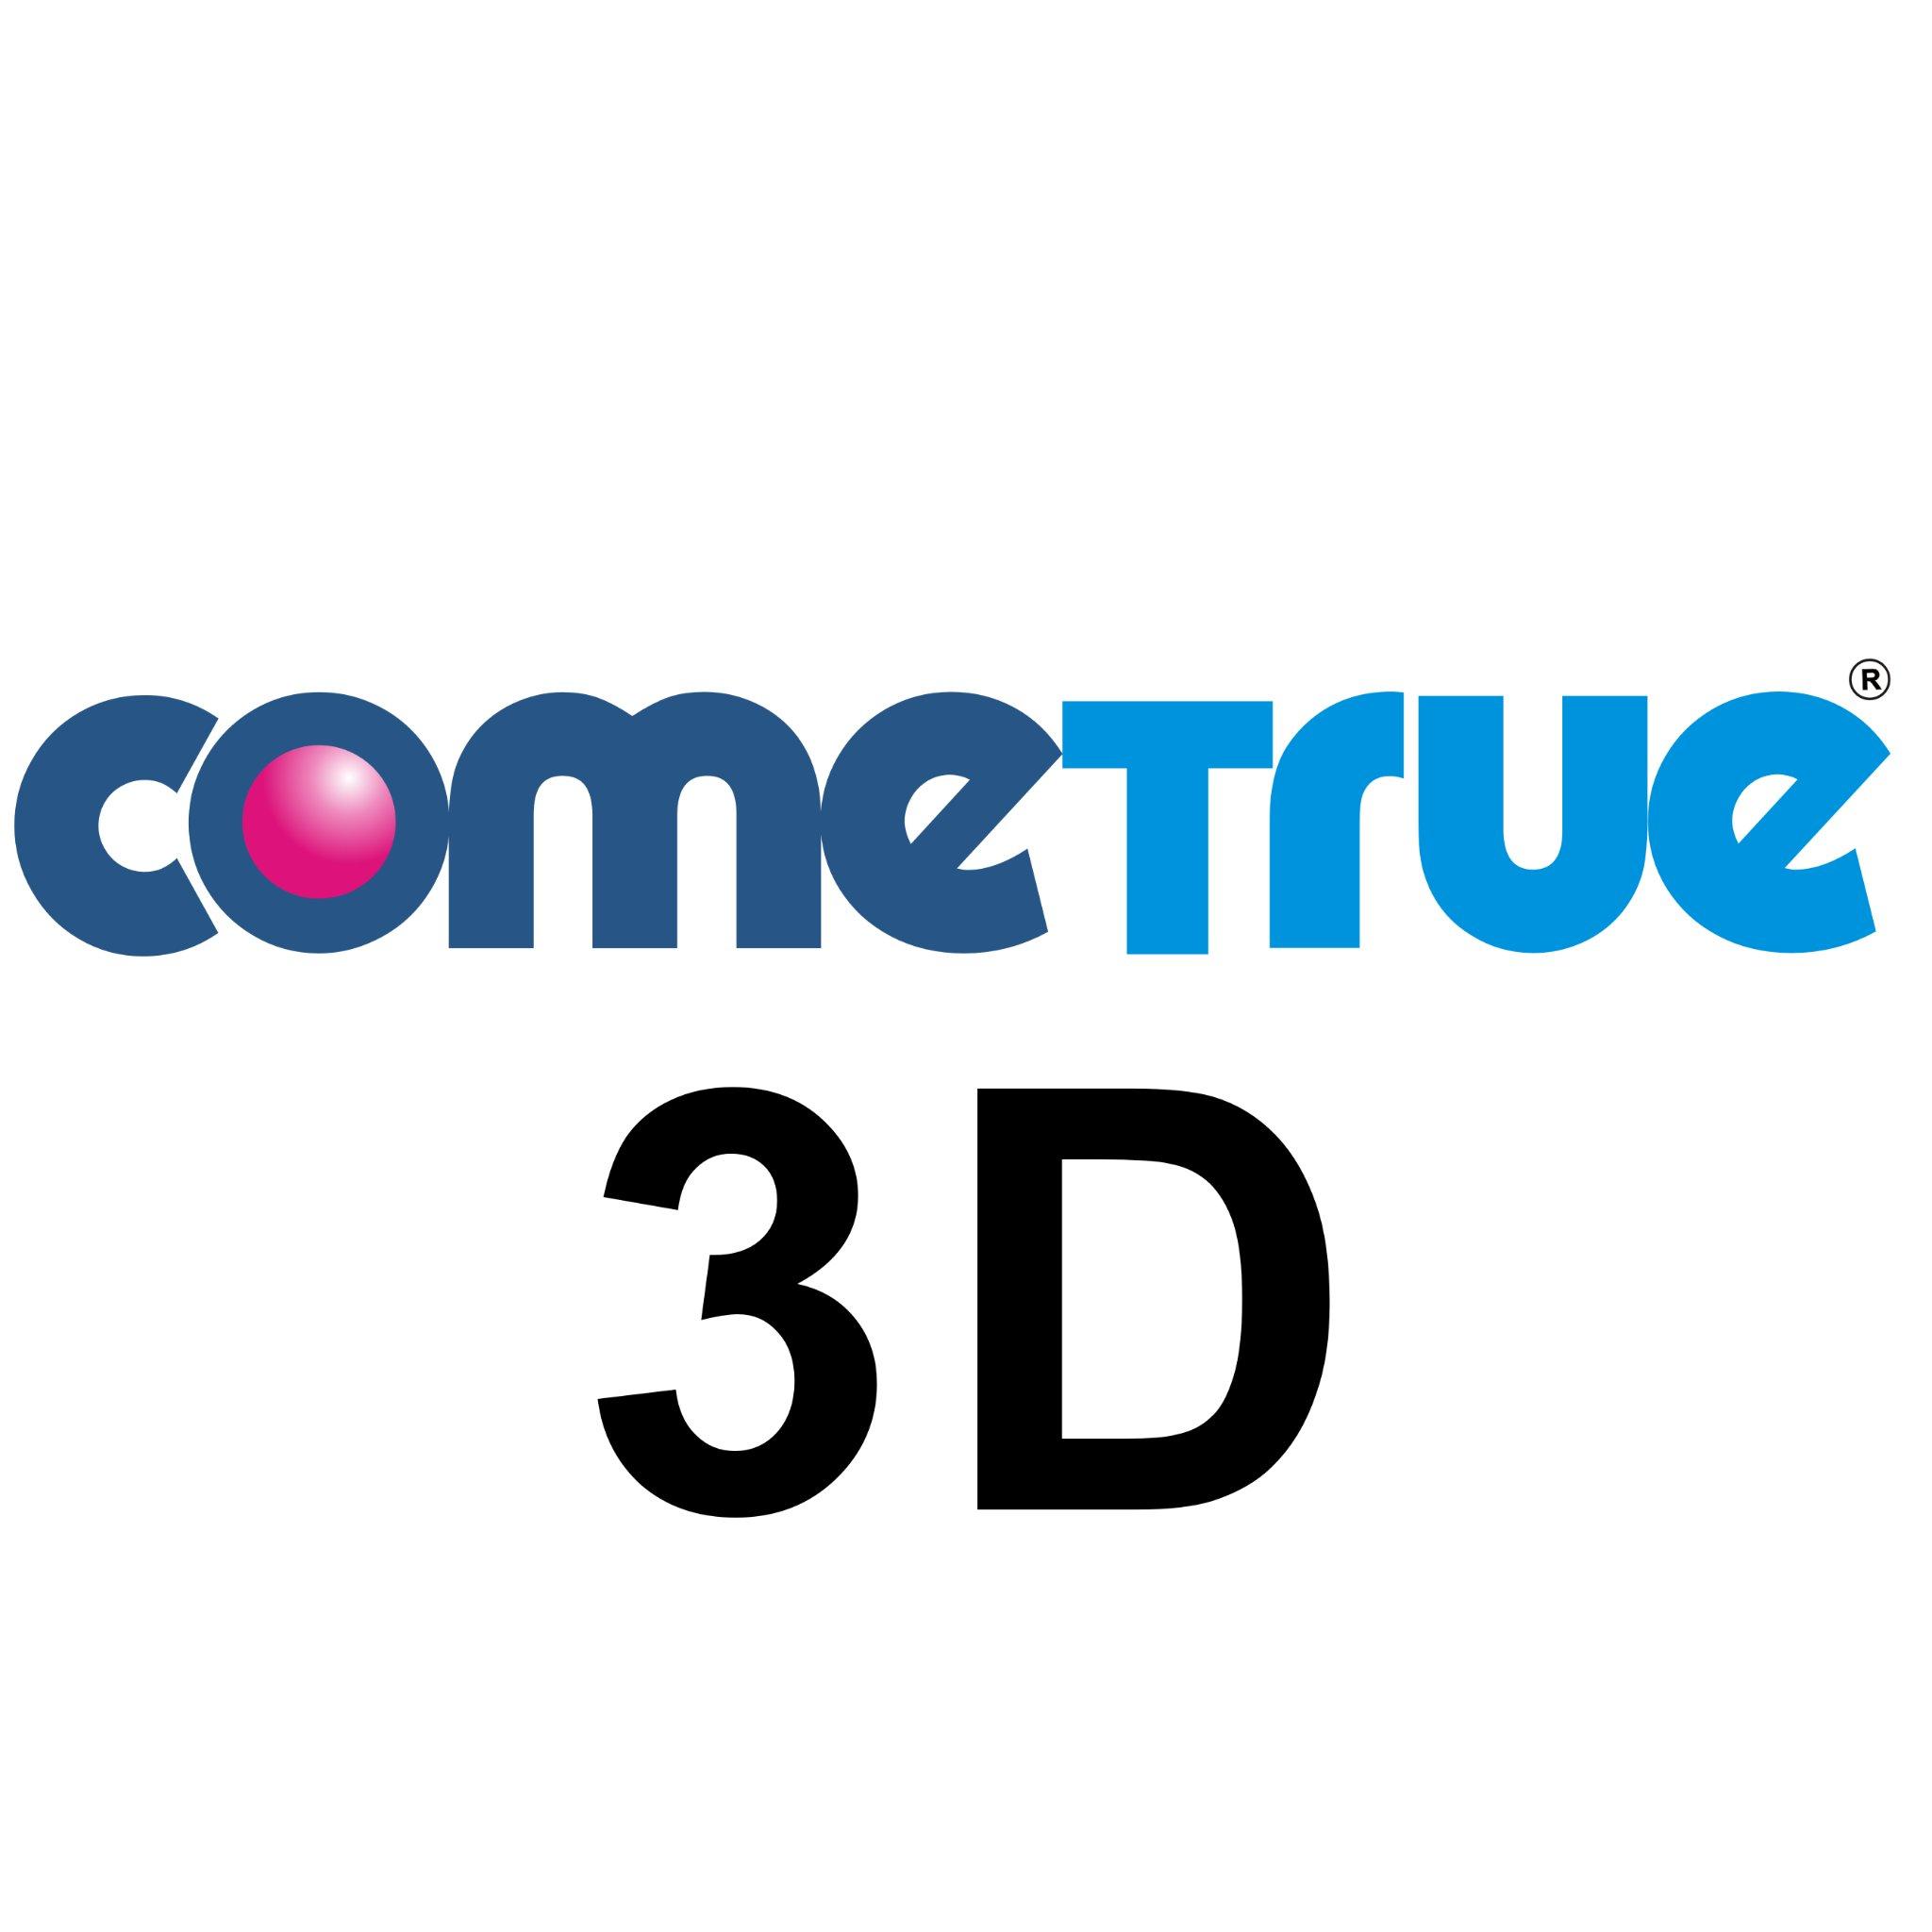 ComeTrue 3D Printing on Twitter: